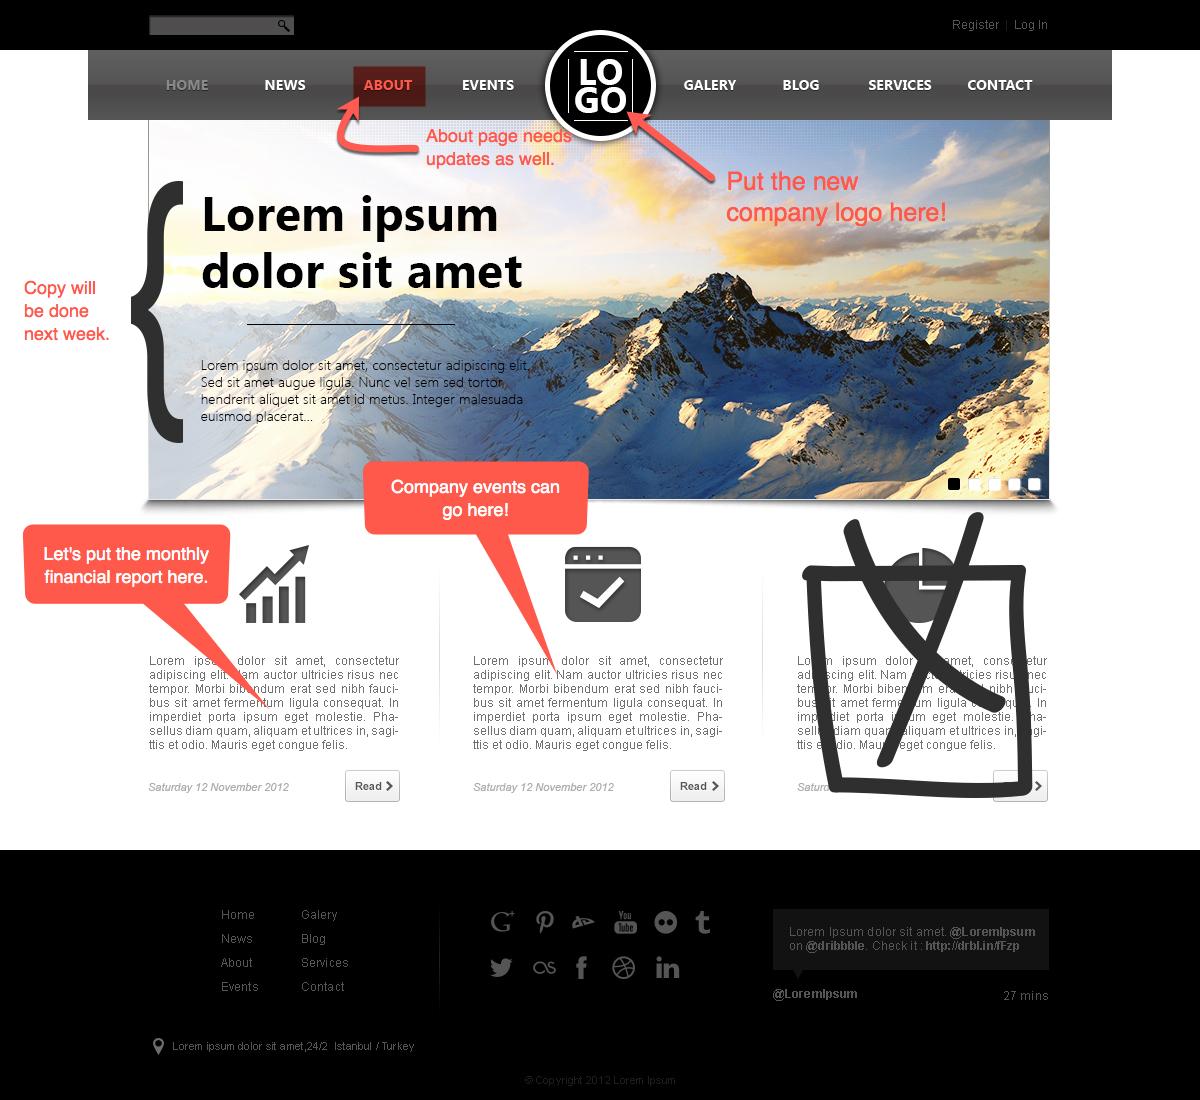 WebsiteFeedback